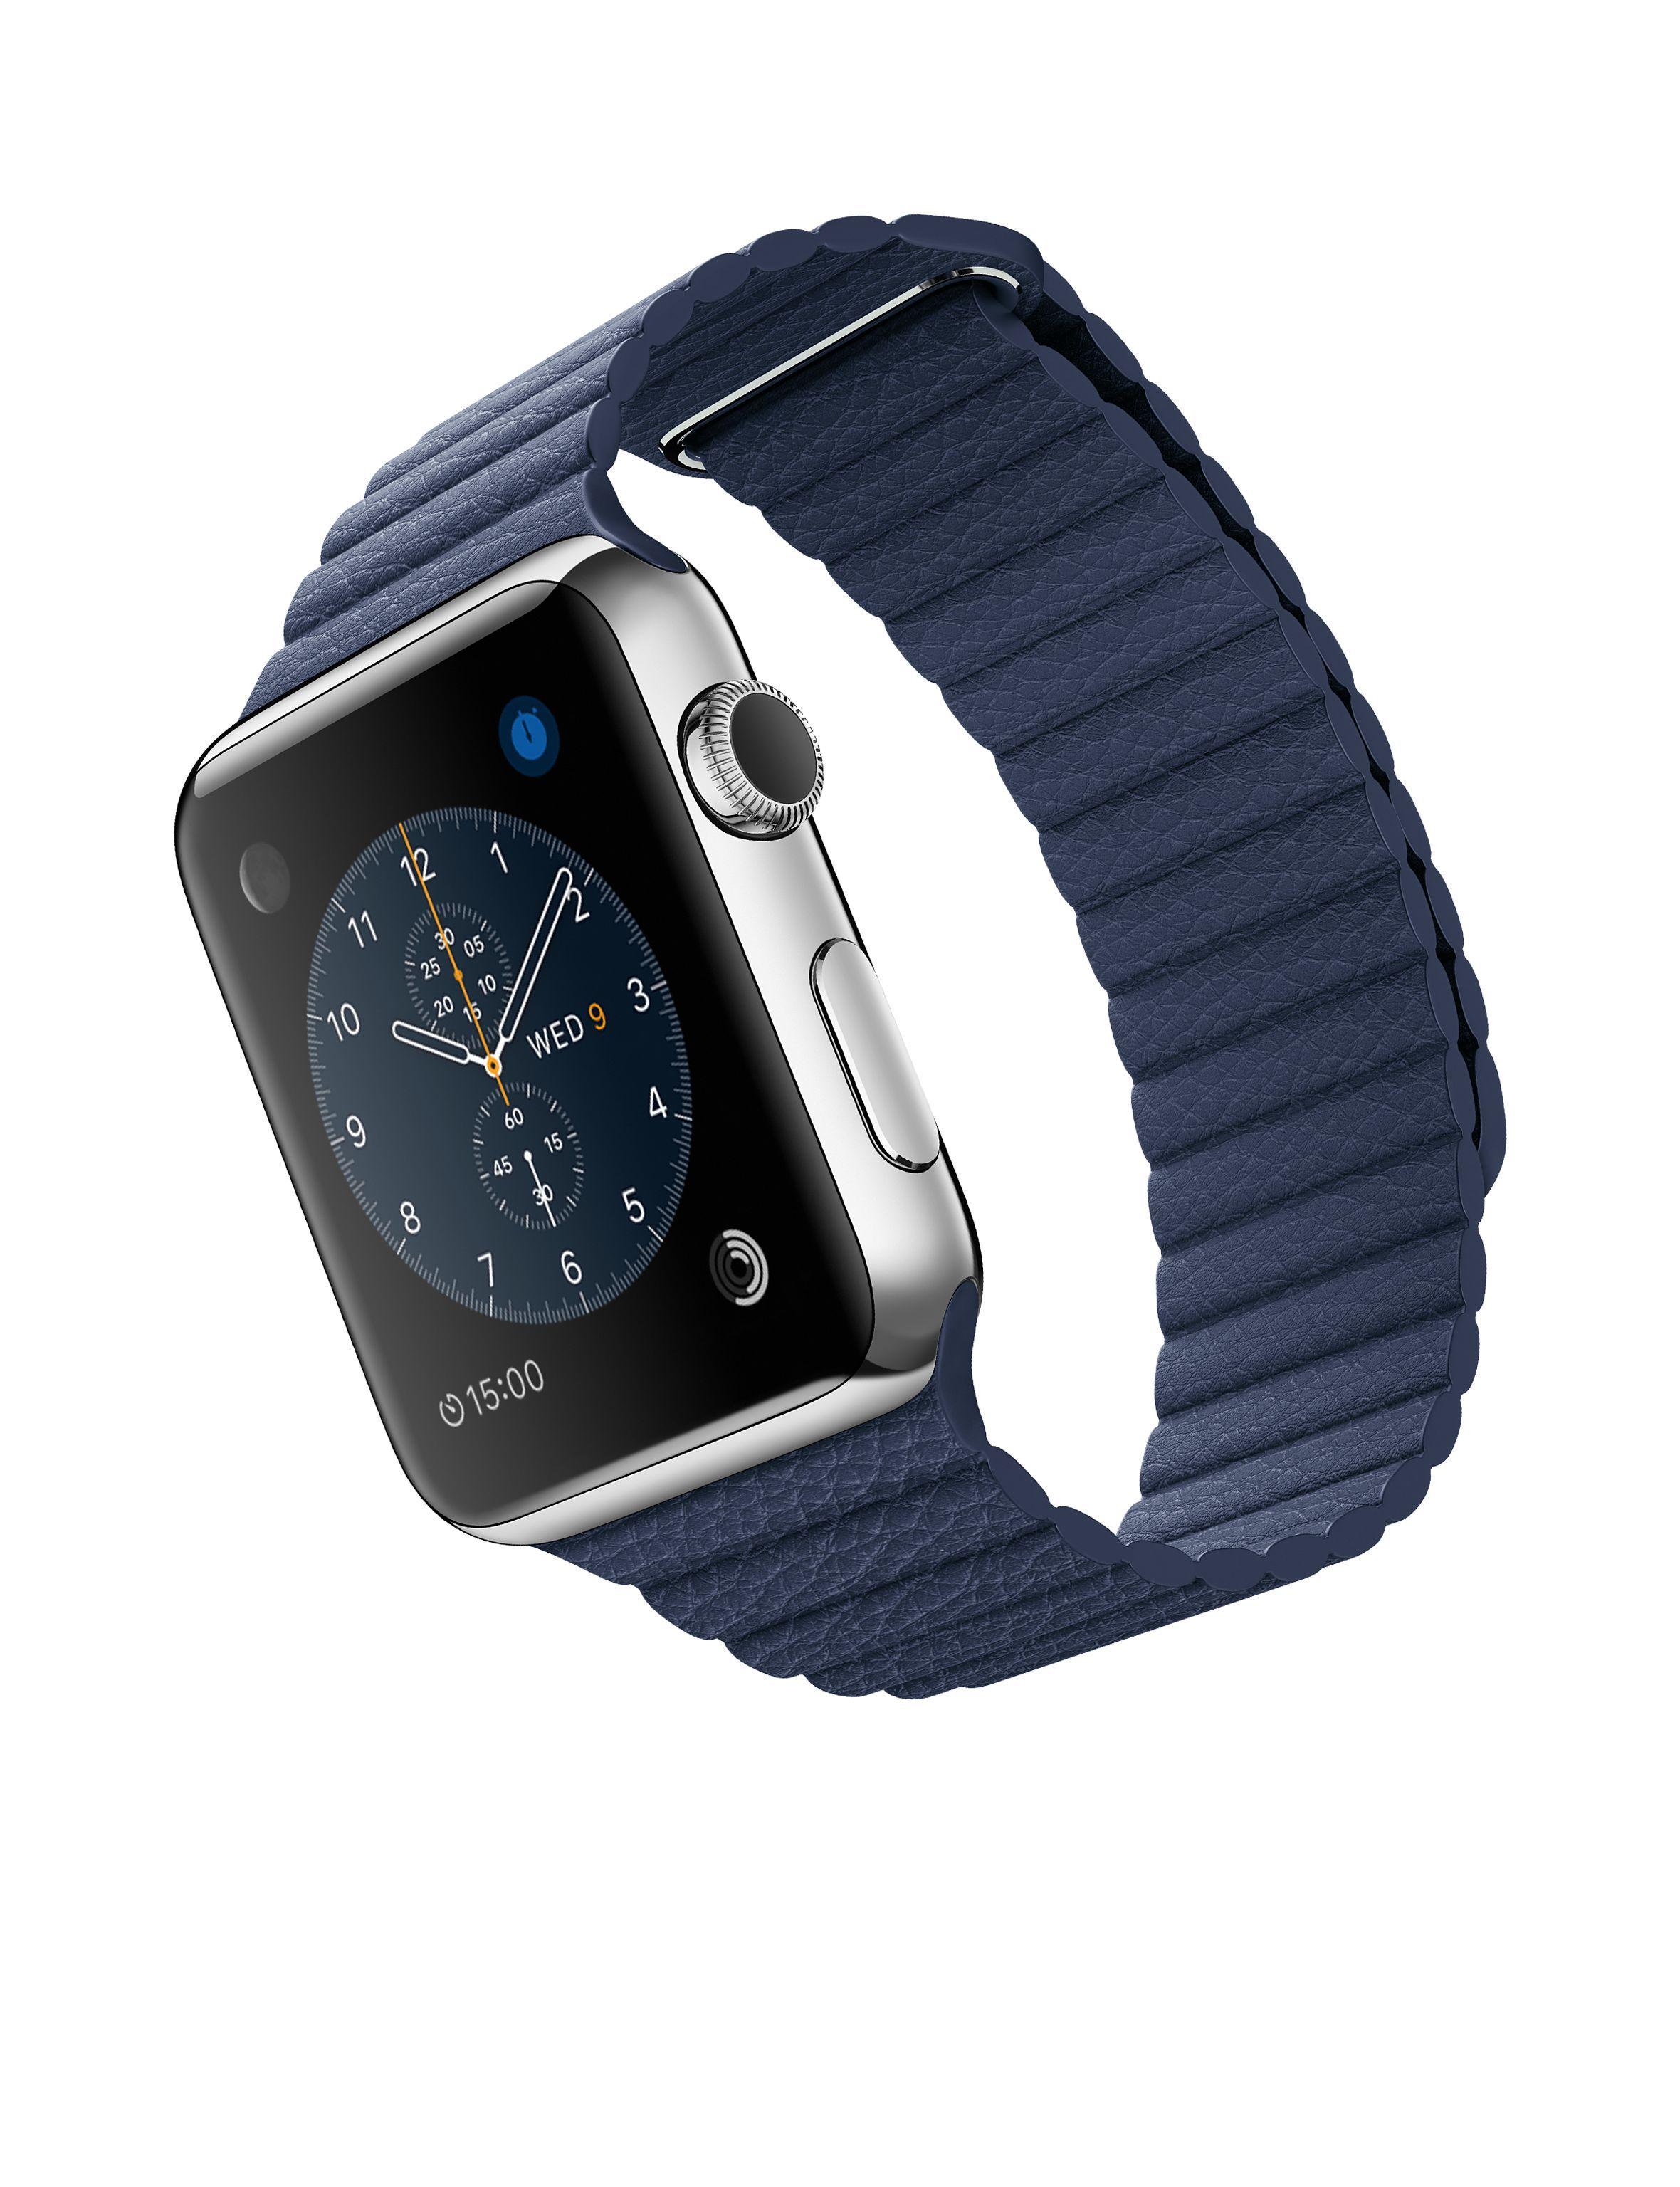 Buy Apple Watch Series 5 Buy Apple Watch Apple Watch Apple Watch Strap